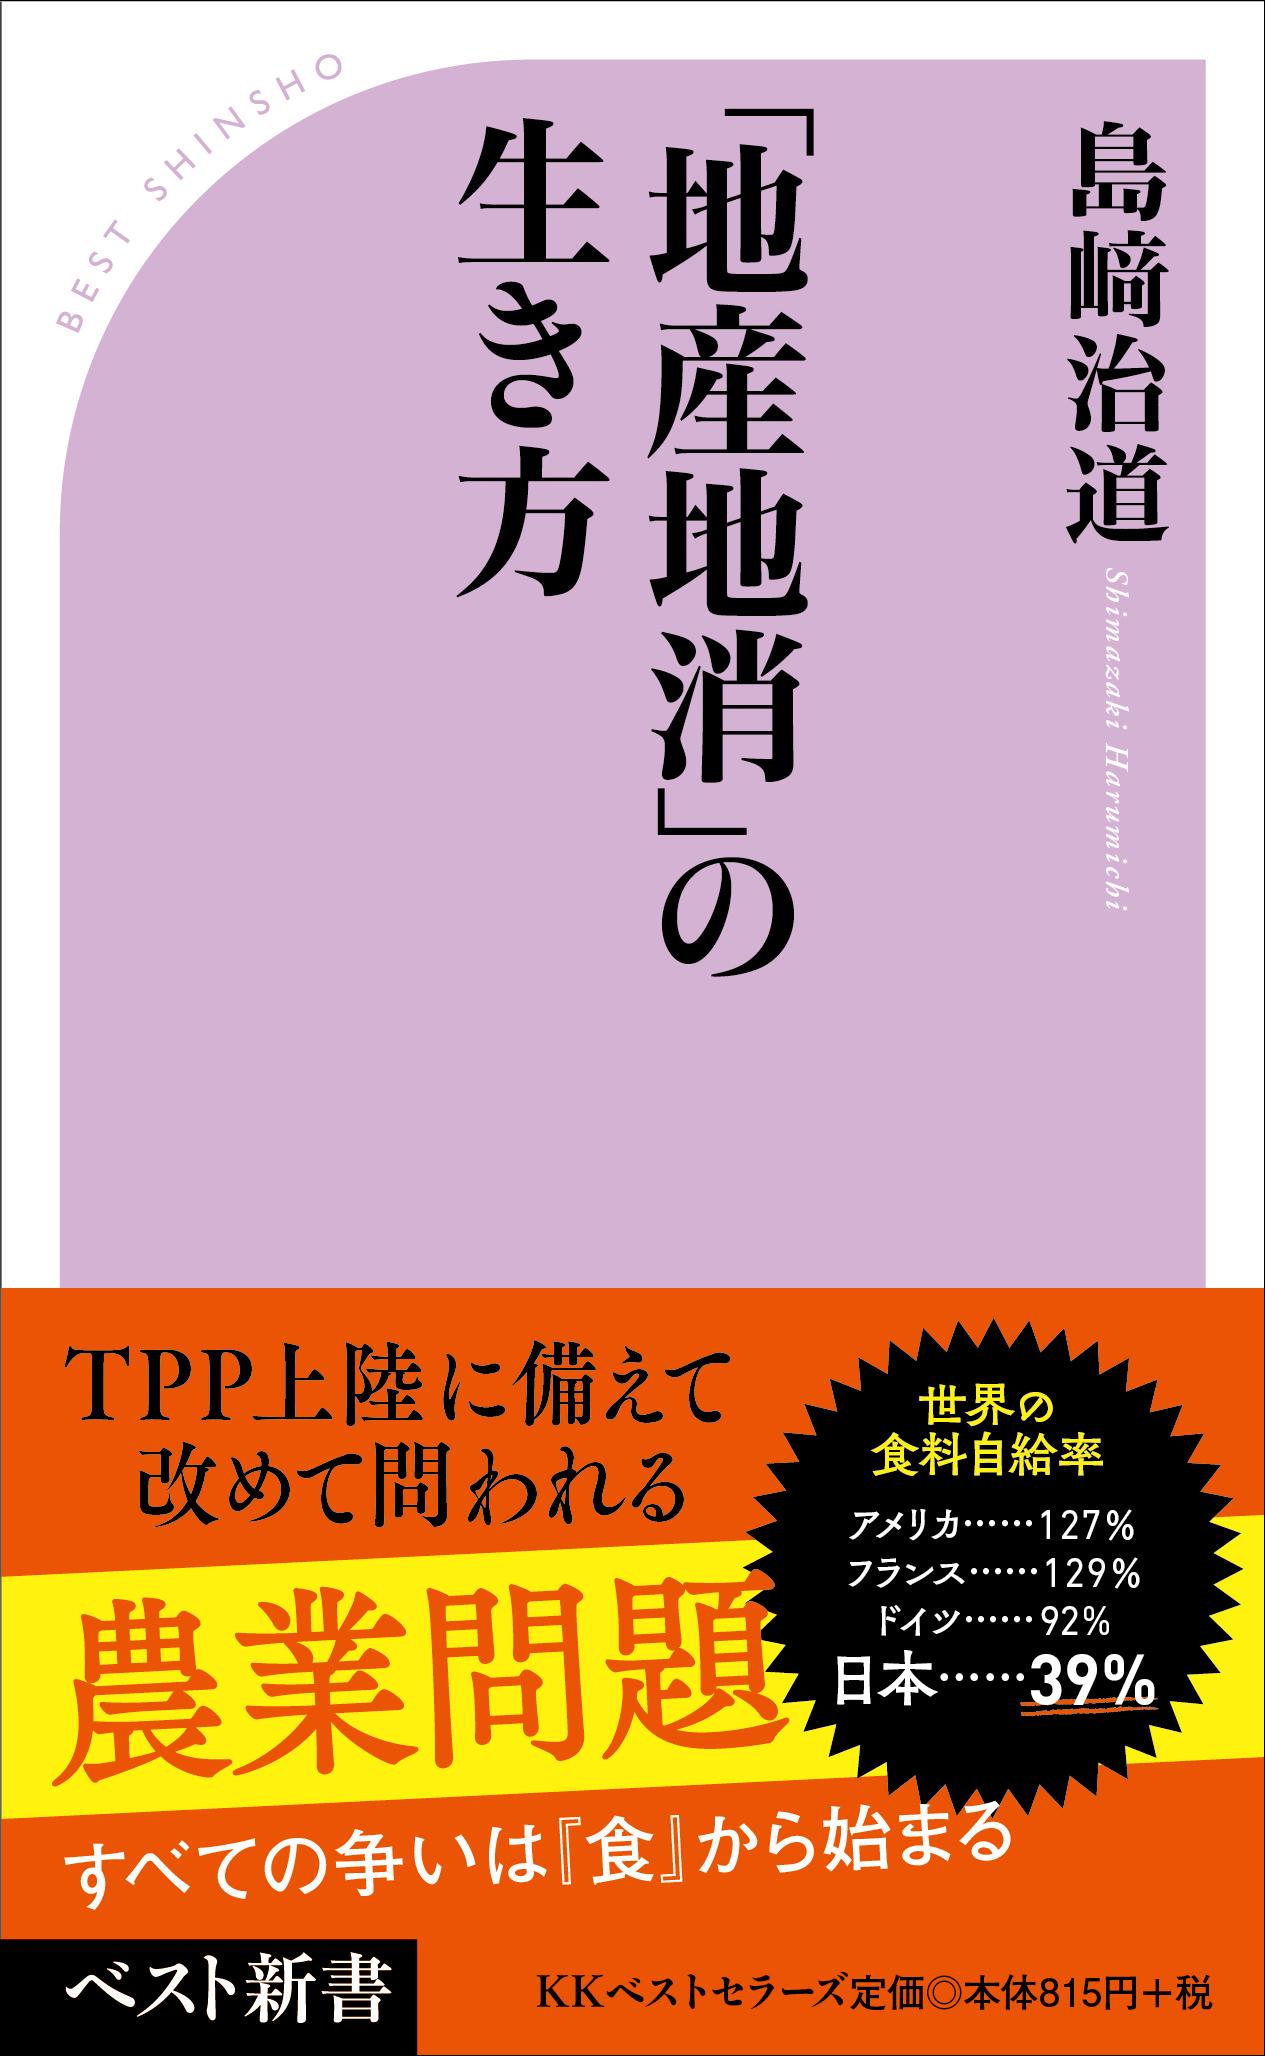 TPP上陸を前に学校給食について考える<br />『地産地消』の生き方が日本を救う